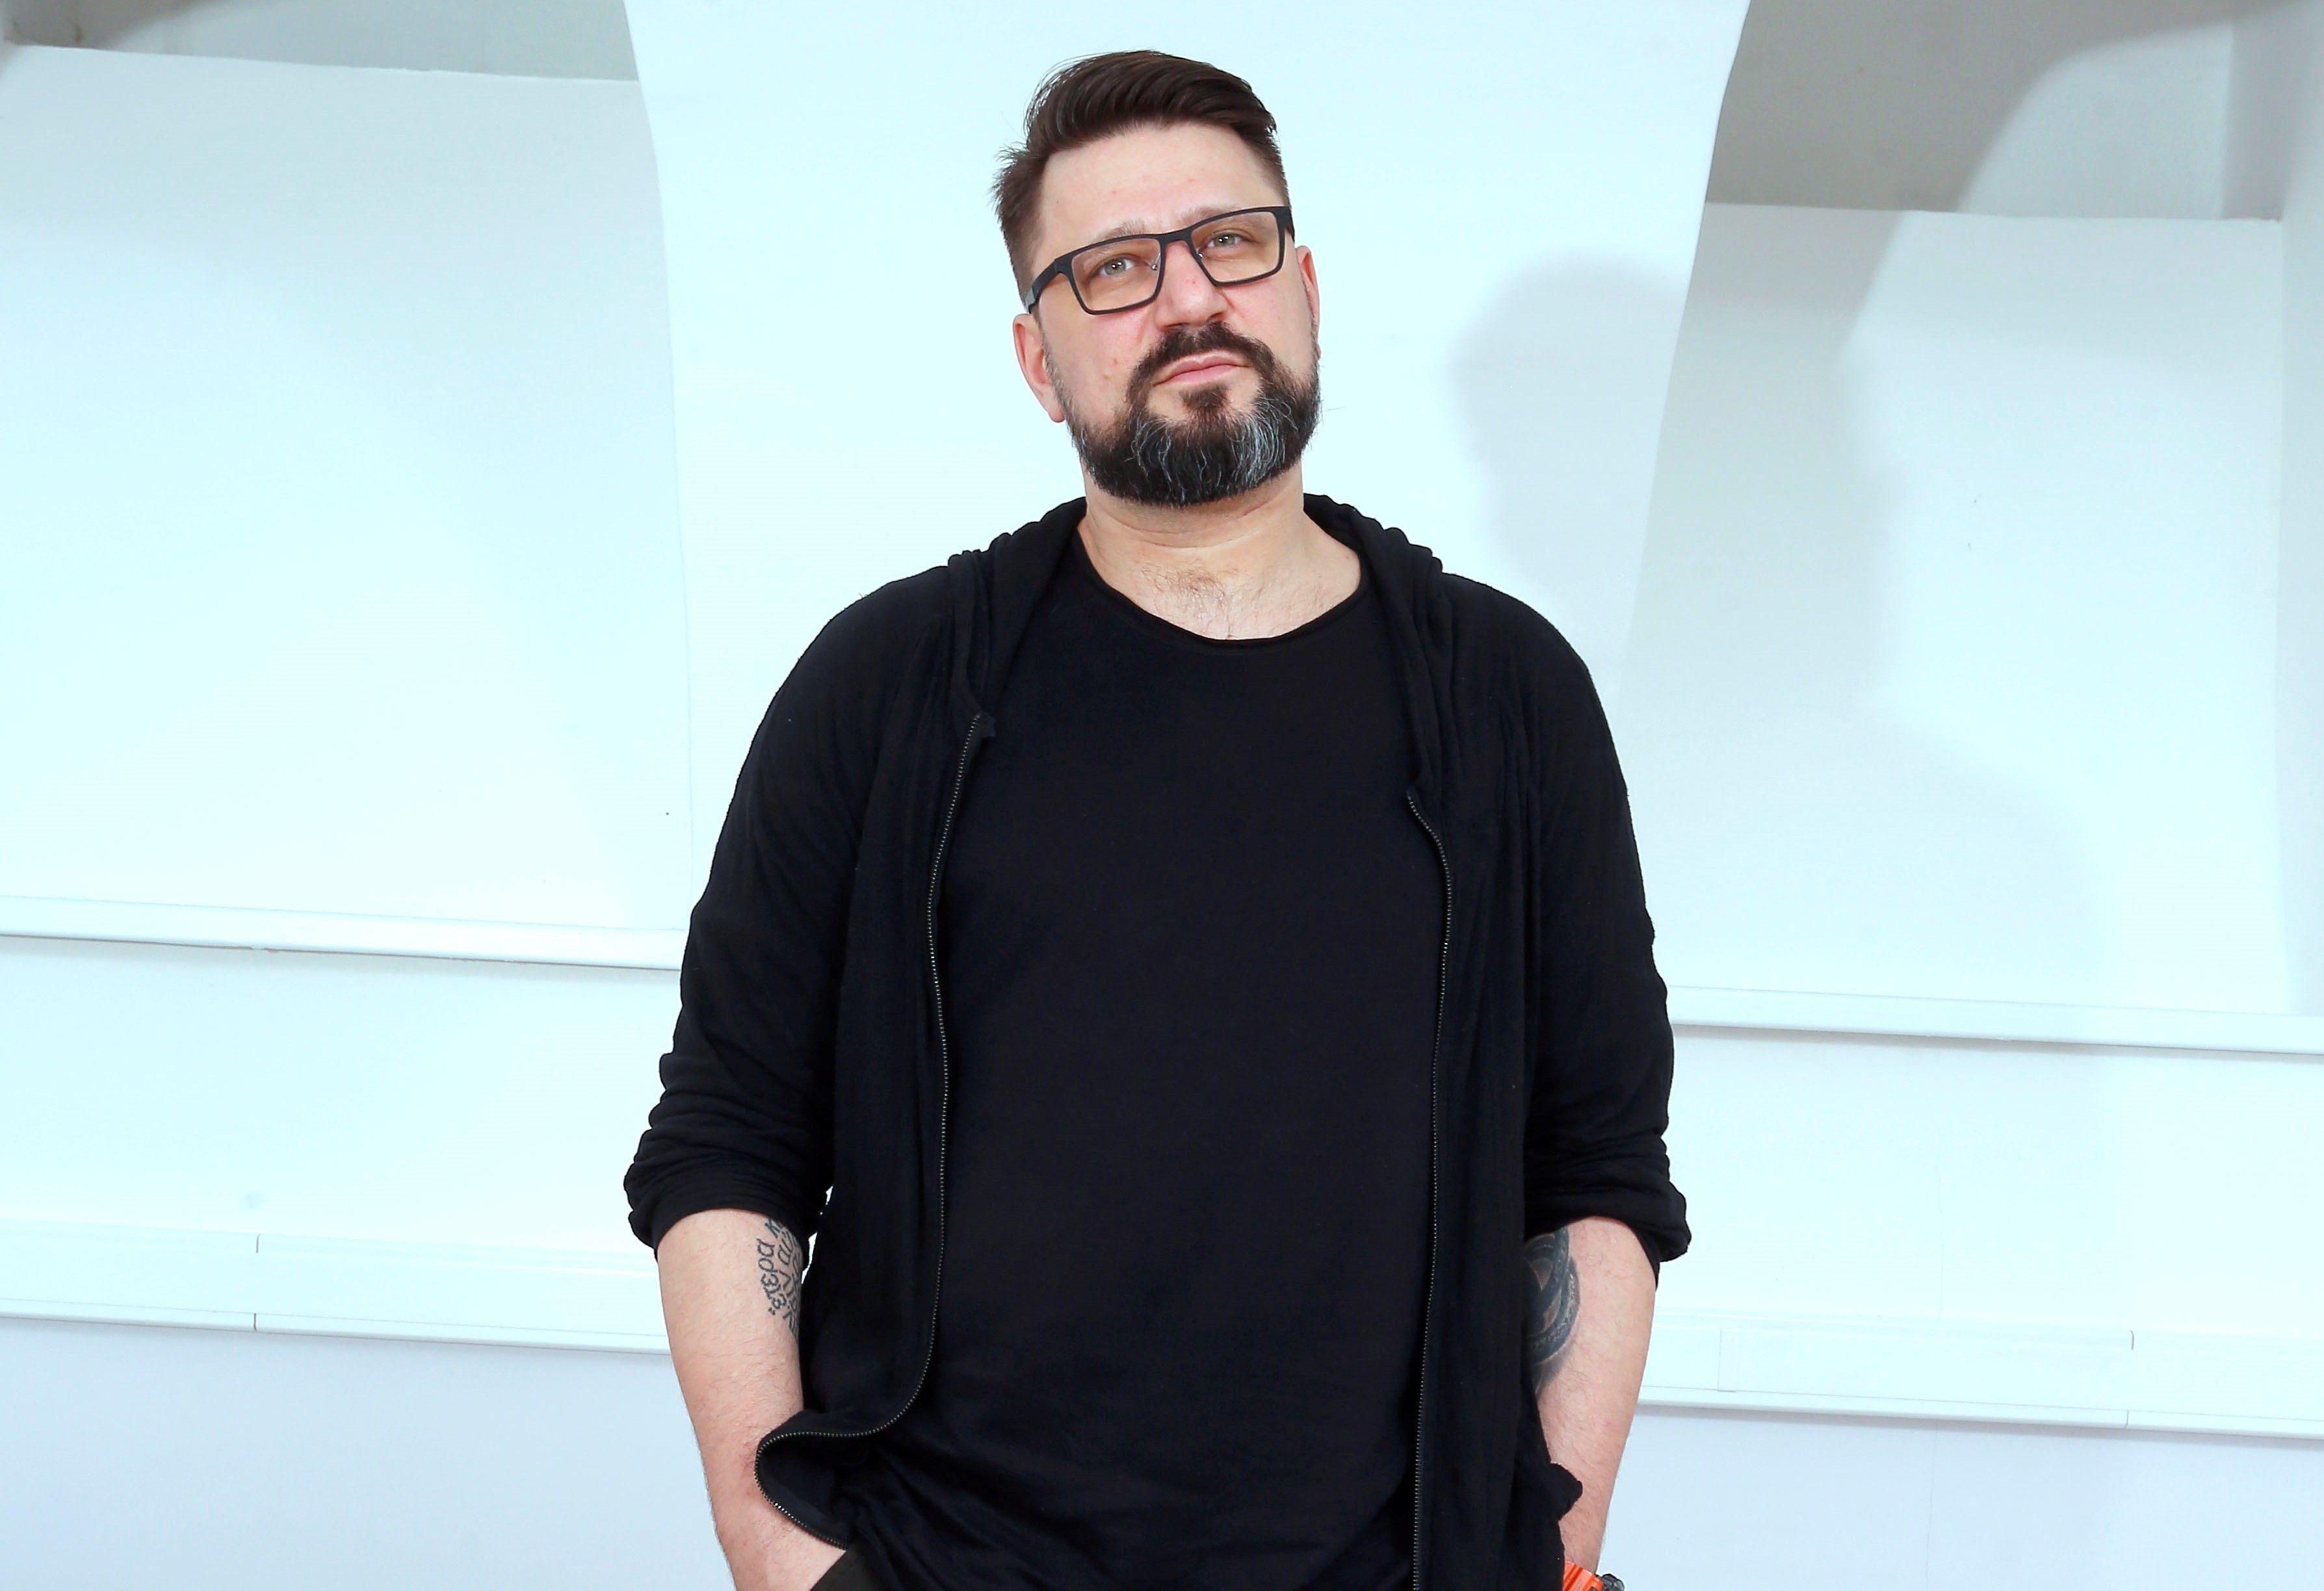 Виктор Логинов: Моя профессия дала мне шанс